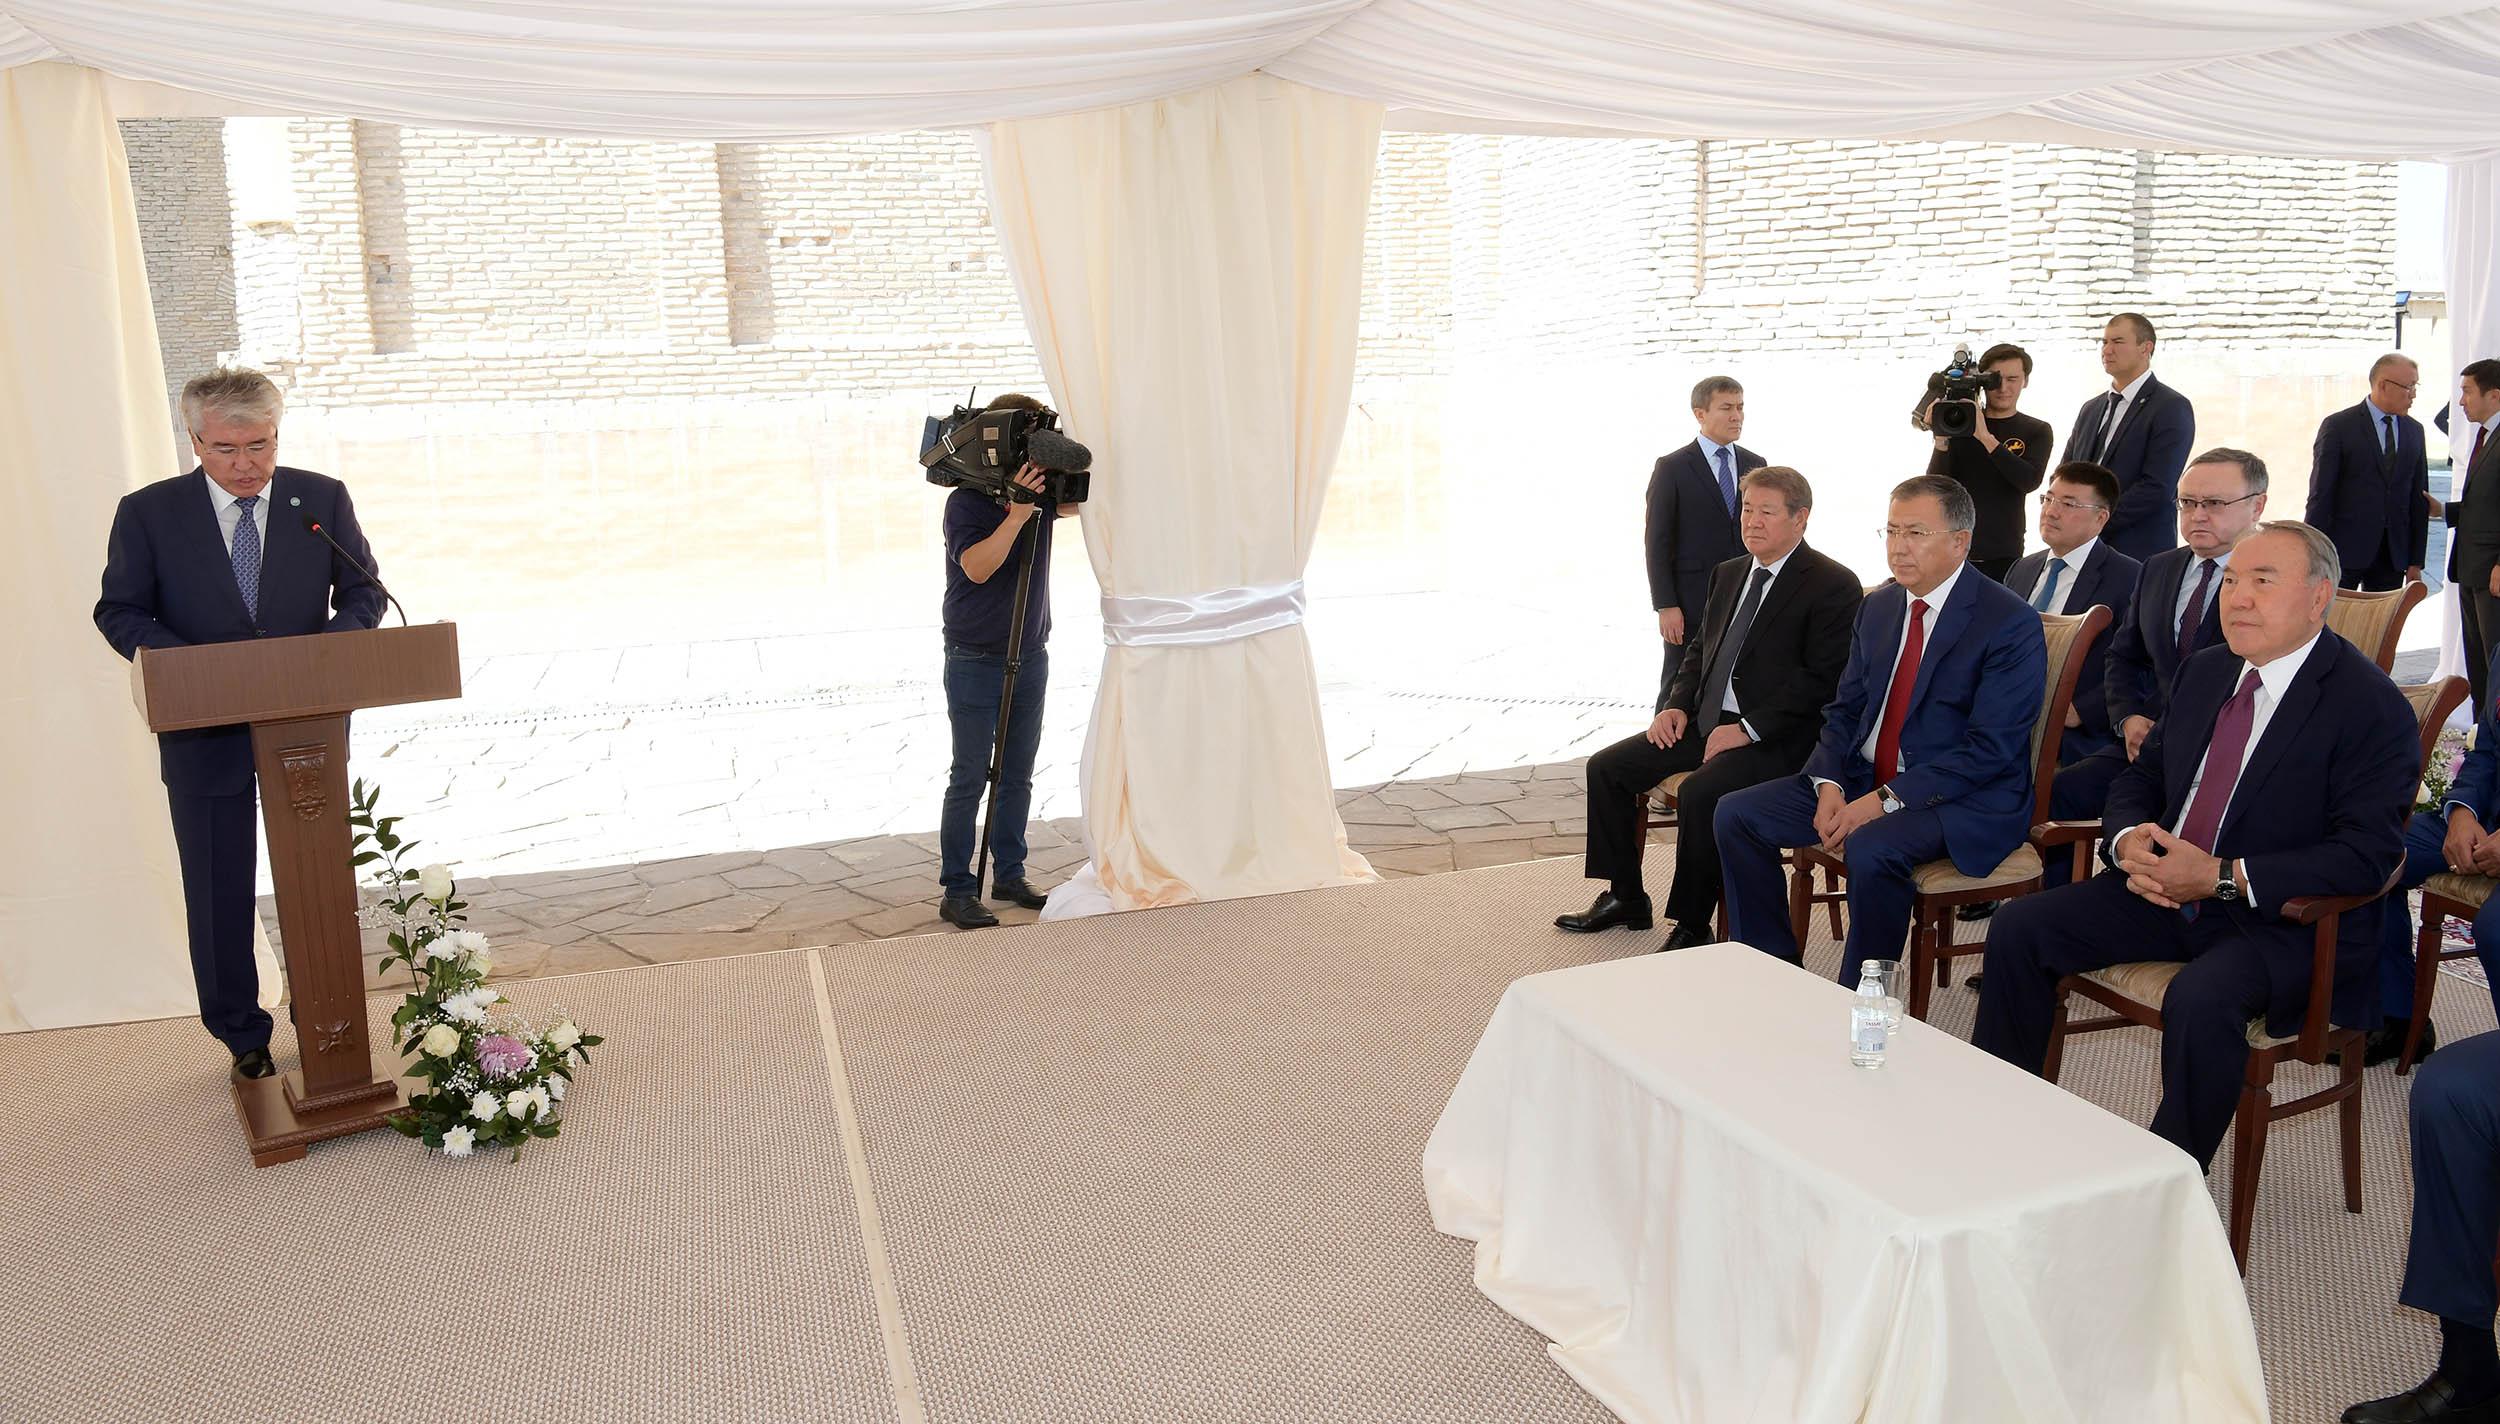 Назарбаев посетил мавзолей Ходжа Ахмеда Ясави в Туркестане